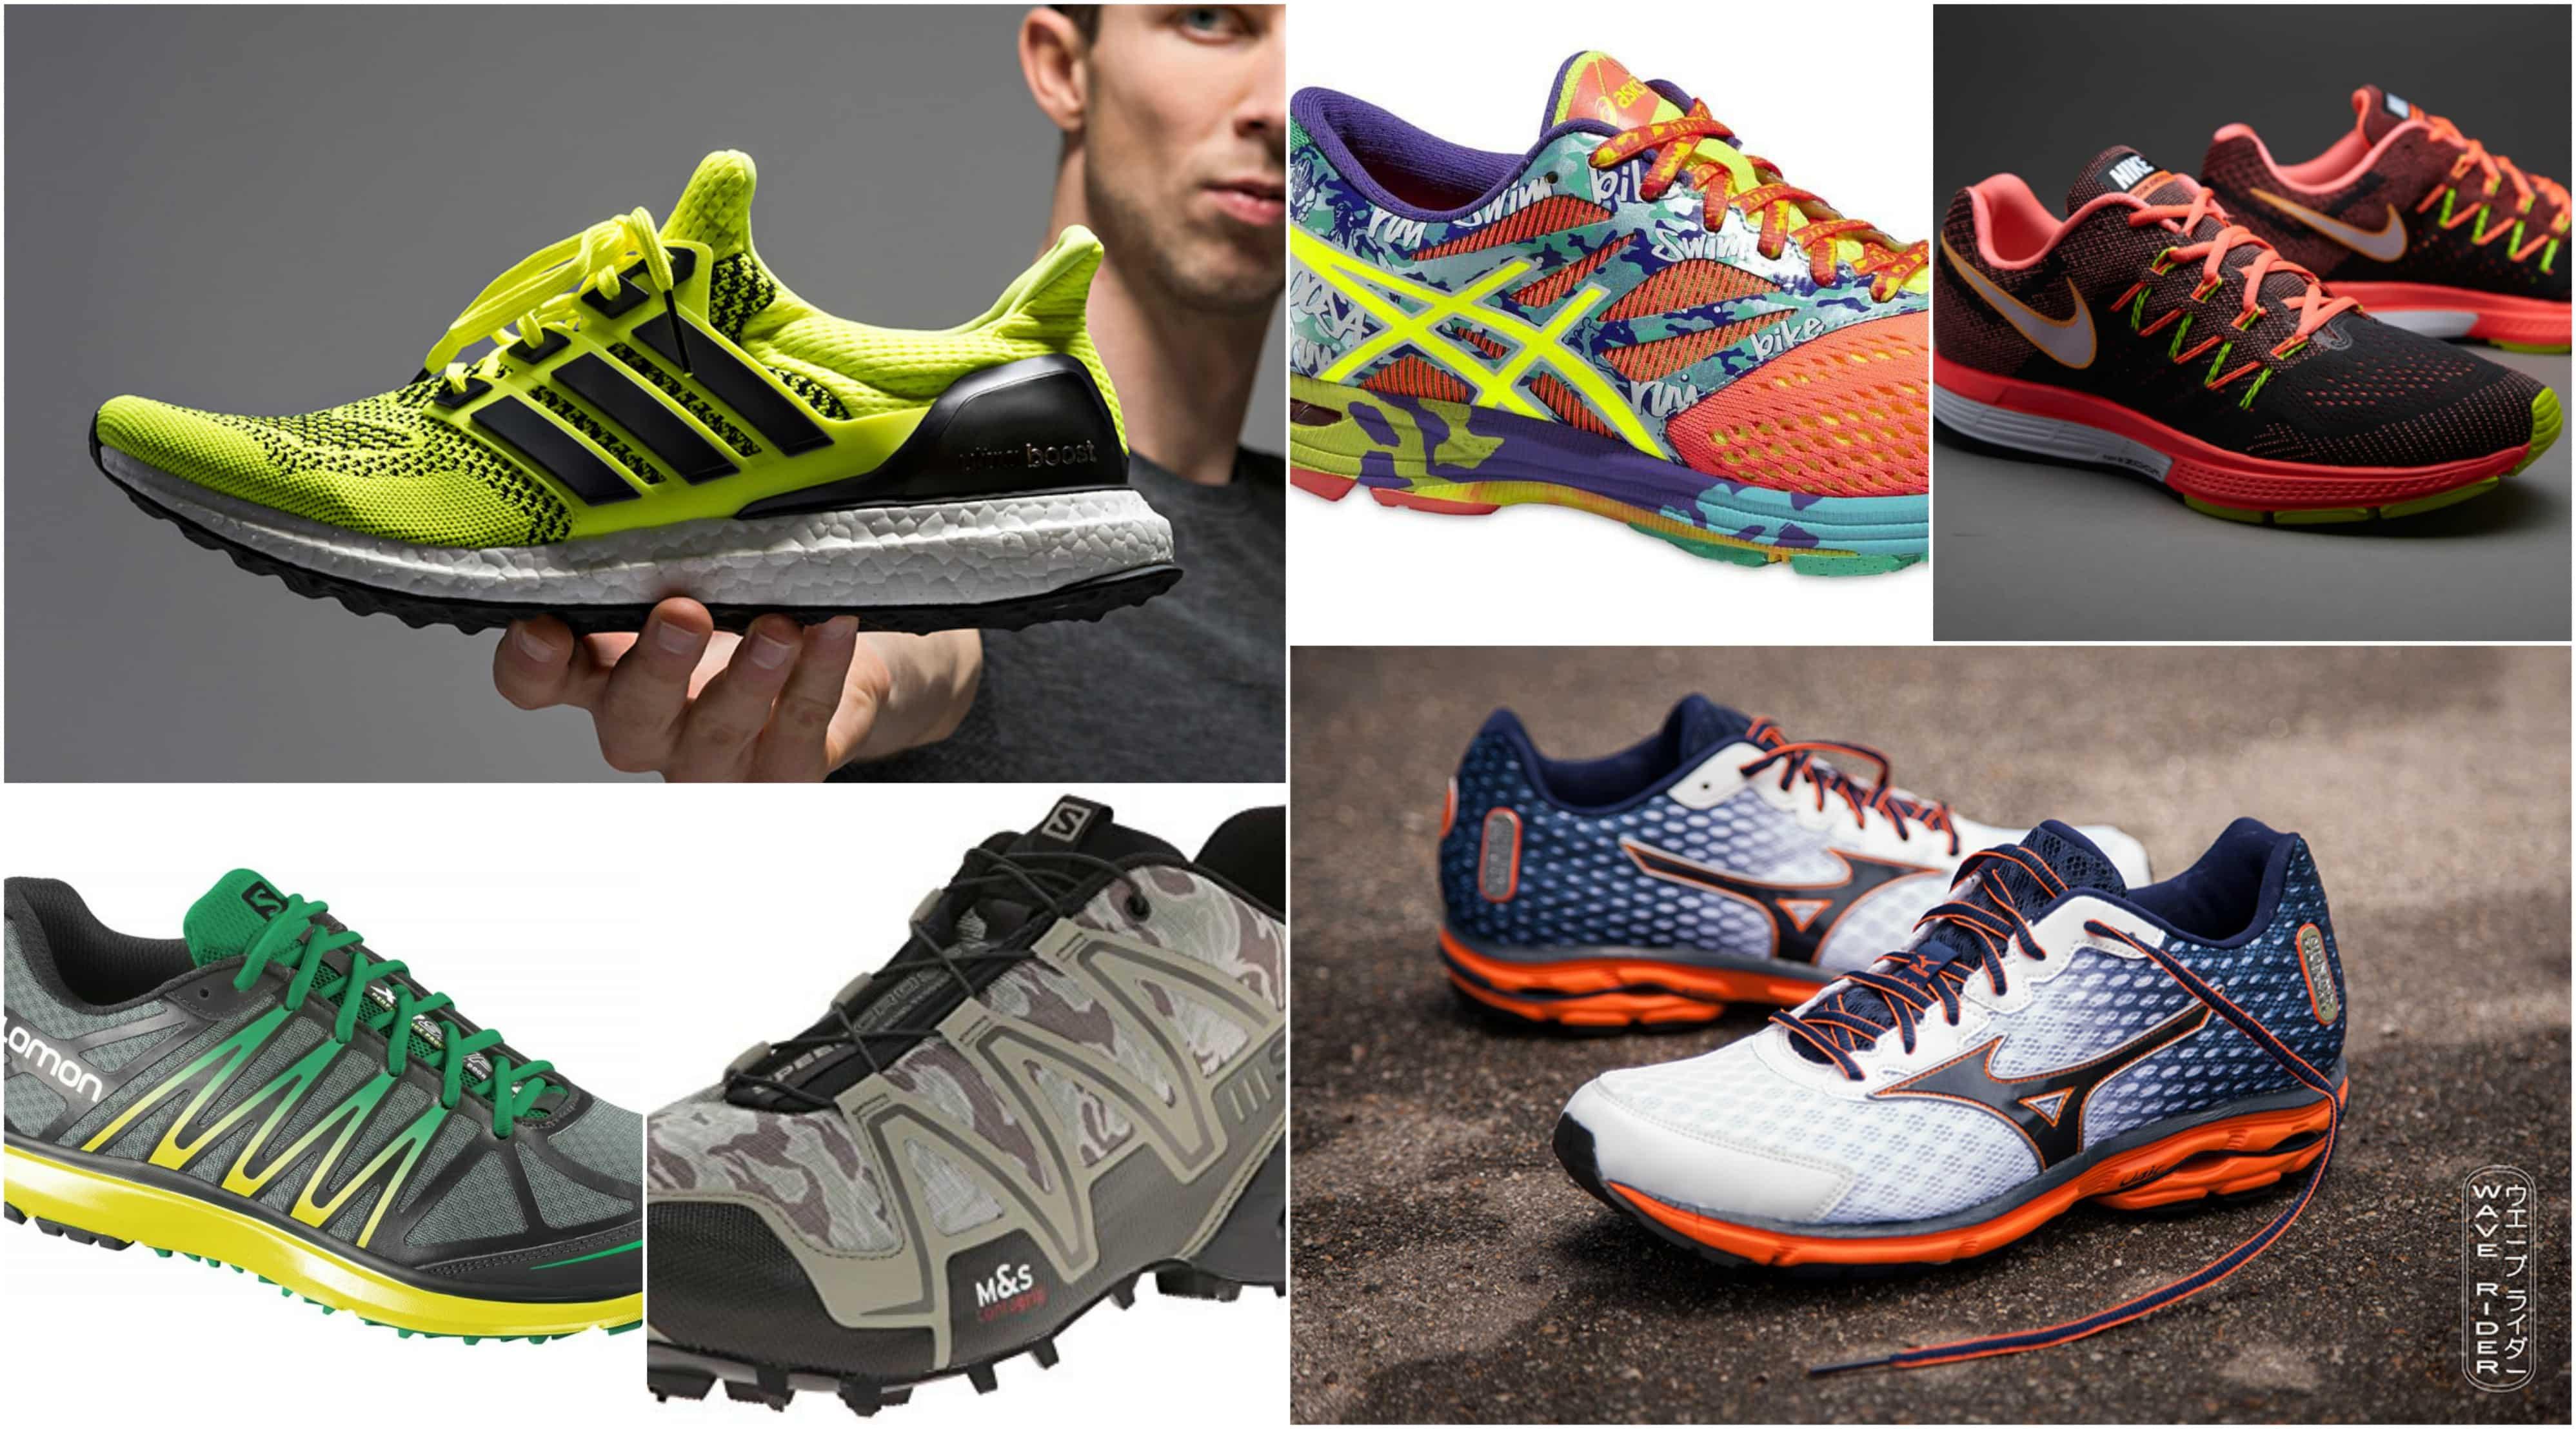 2aa5833912 8 δυνατές Προσφορές για παπούτσια για τρέξιμο - Running Magazine